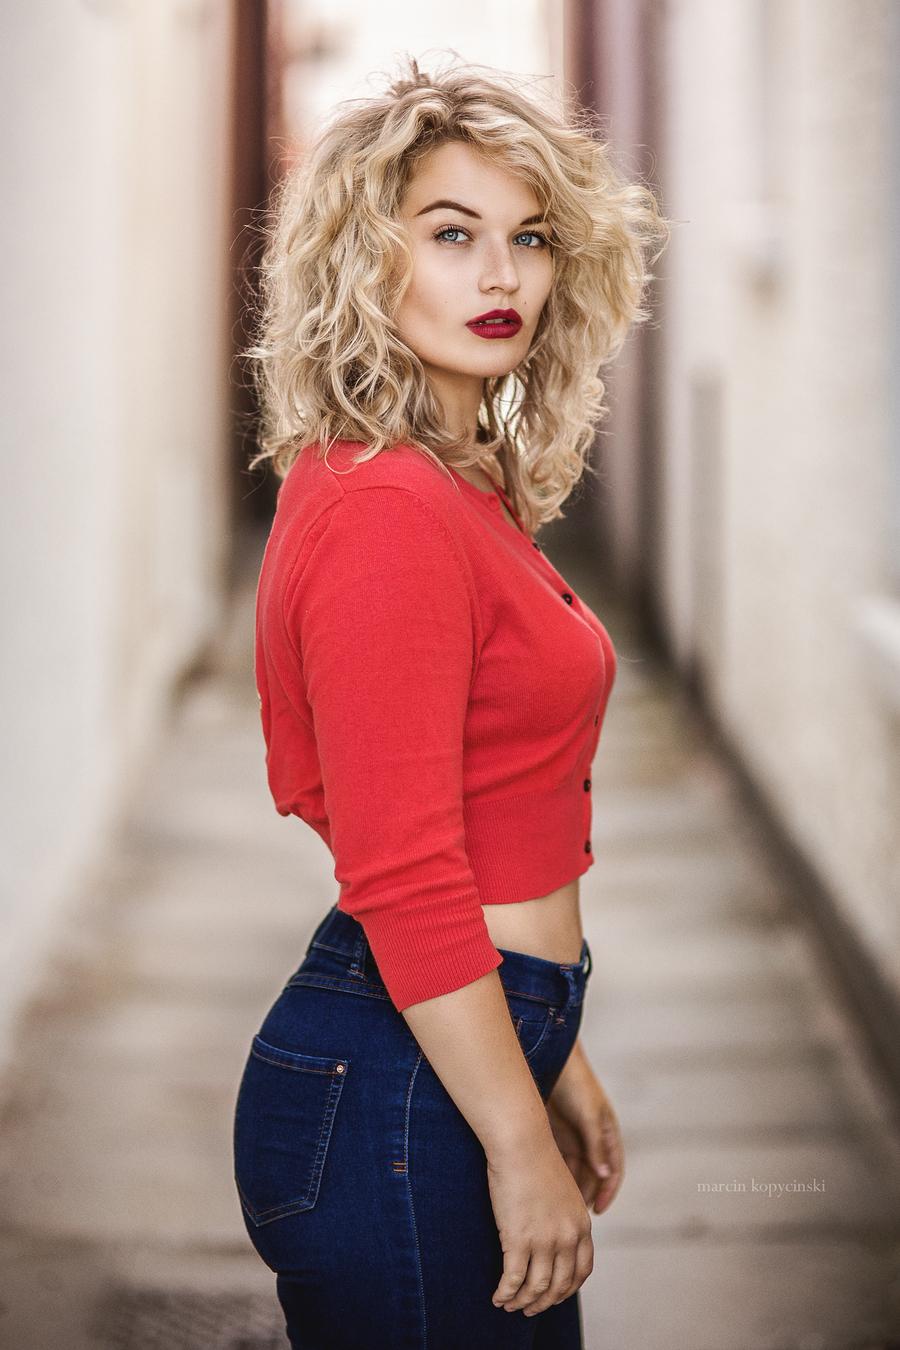 Catfish / Photography by Marcin K, Model Jessica Megan / Uploaded 7th October 2016 @ 10:56 AM